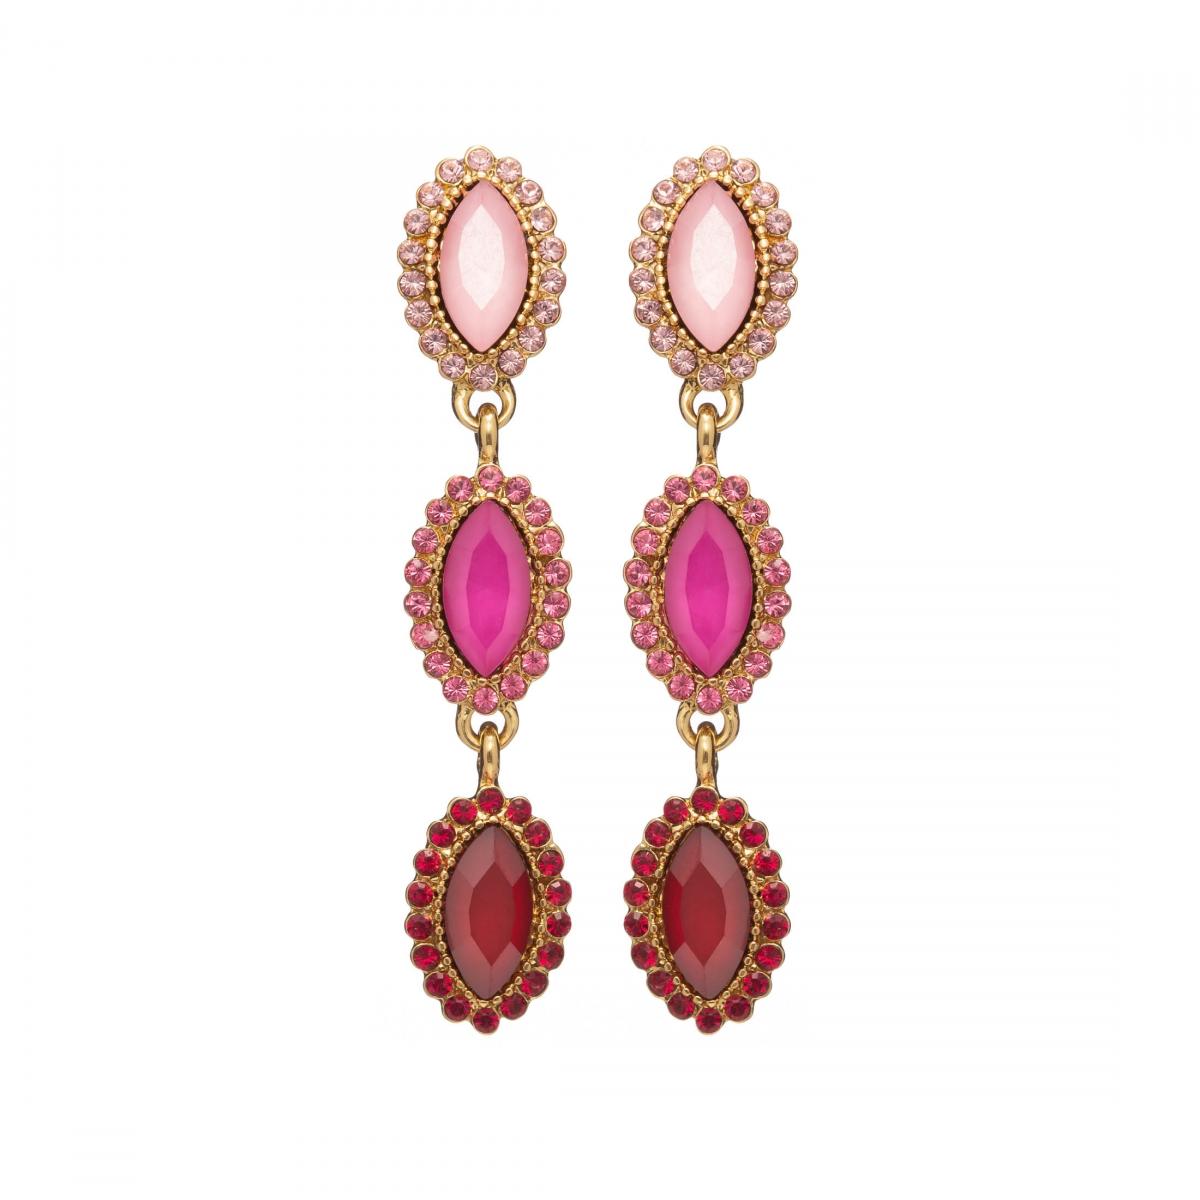 Náušnice Elise Fine Exclusive Elegance Fuchsia Crystals Gold